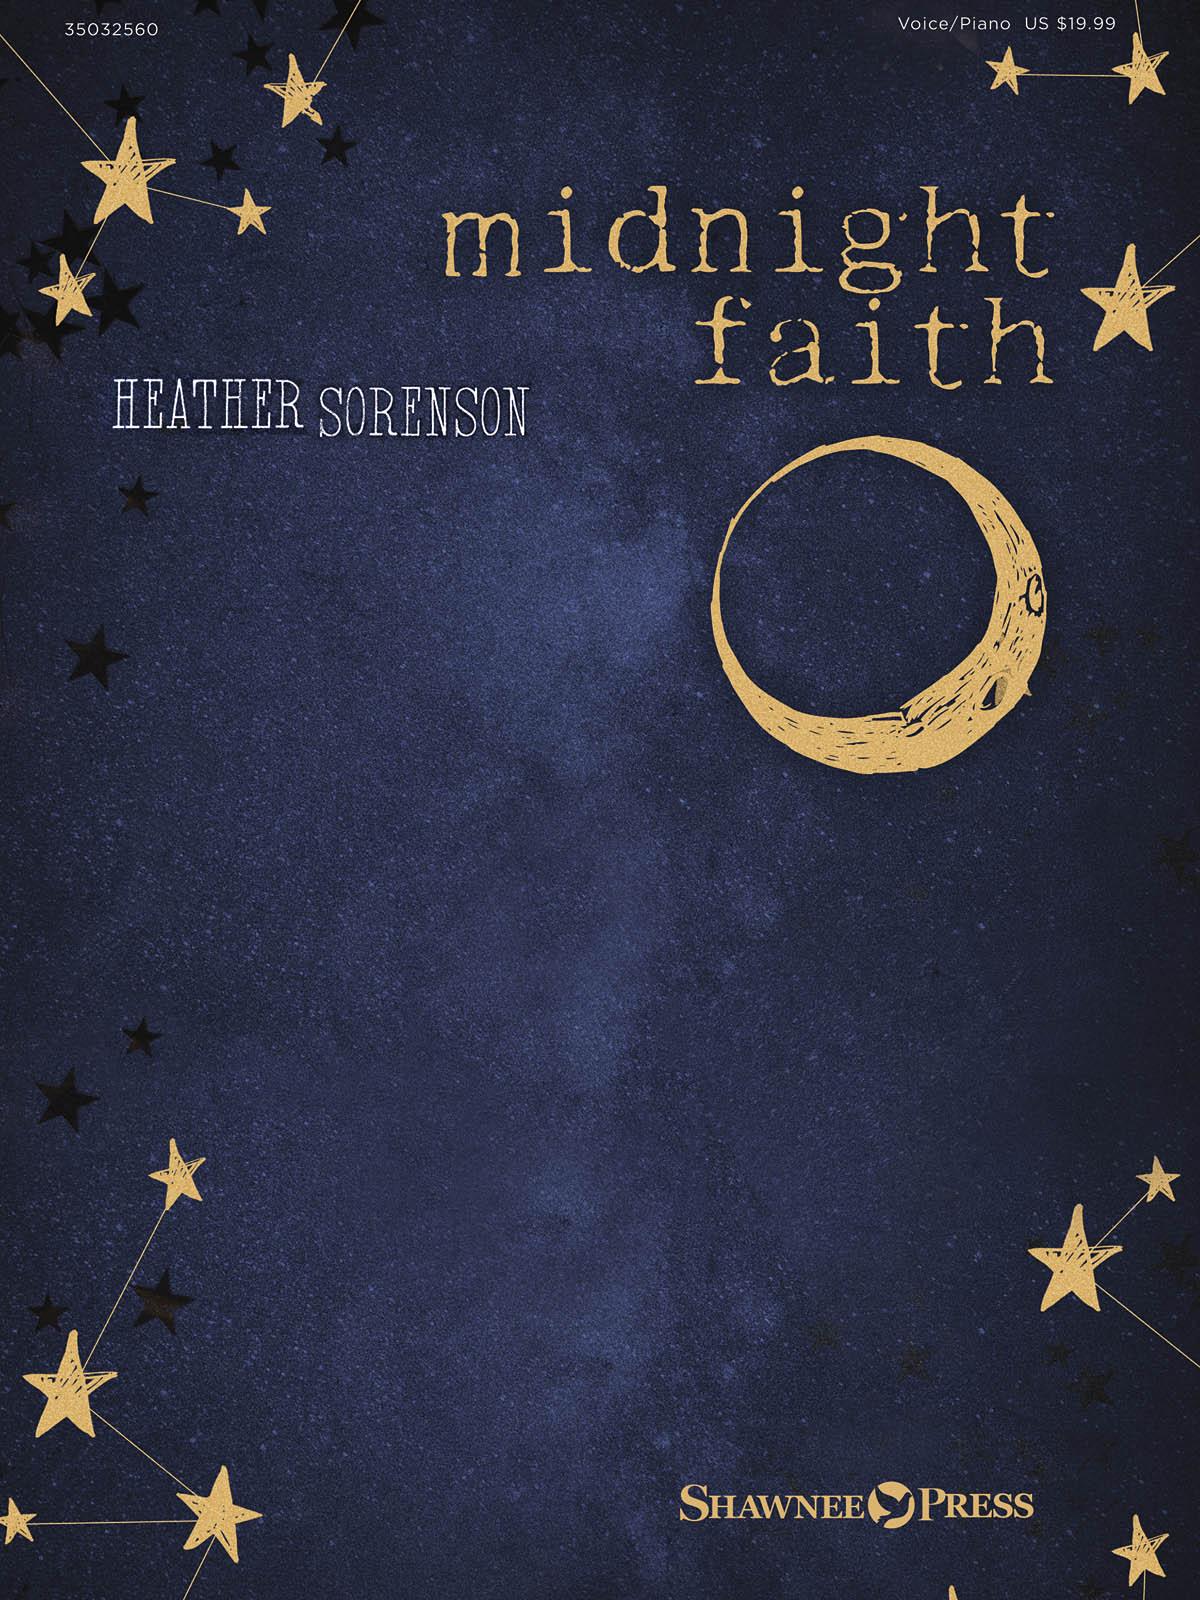 Heather Sorenson: Midnight Faith: Voice: Album Songbook